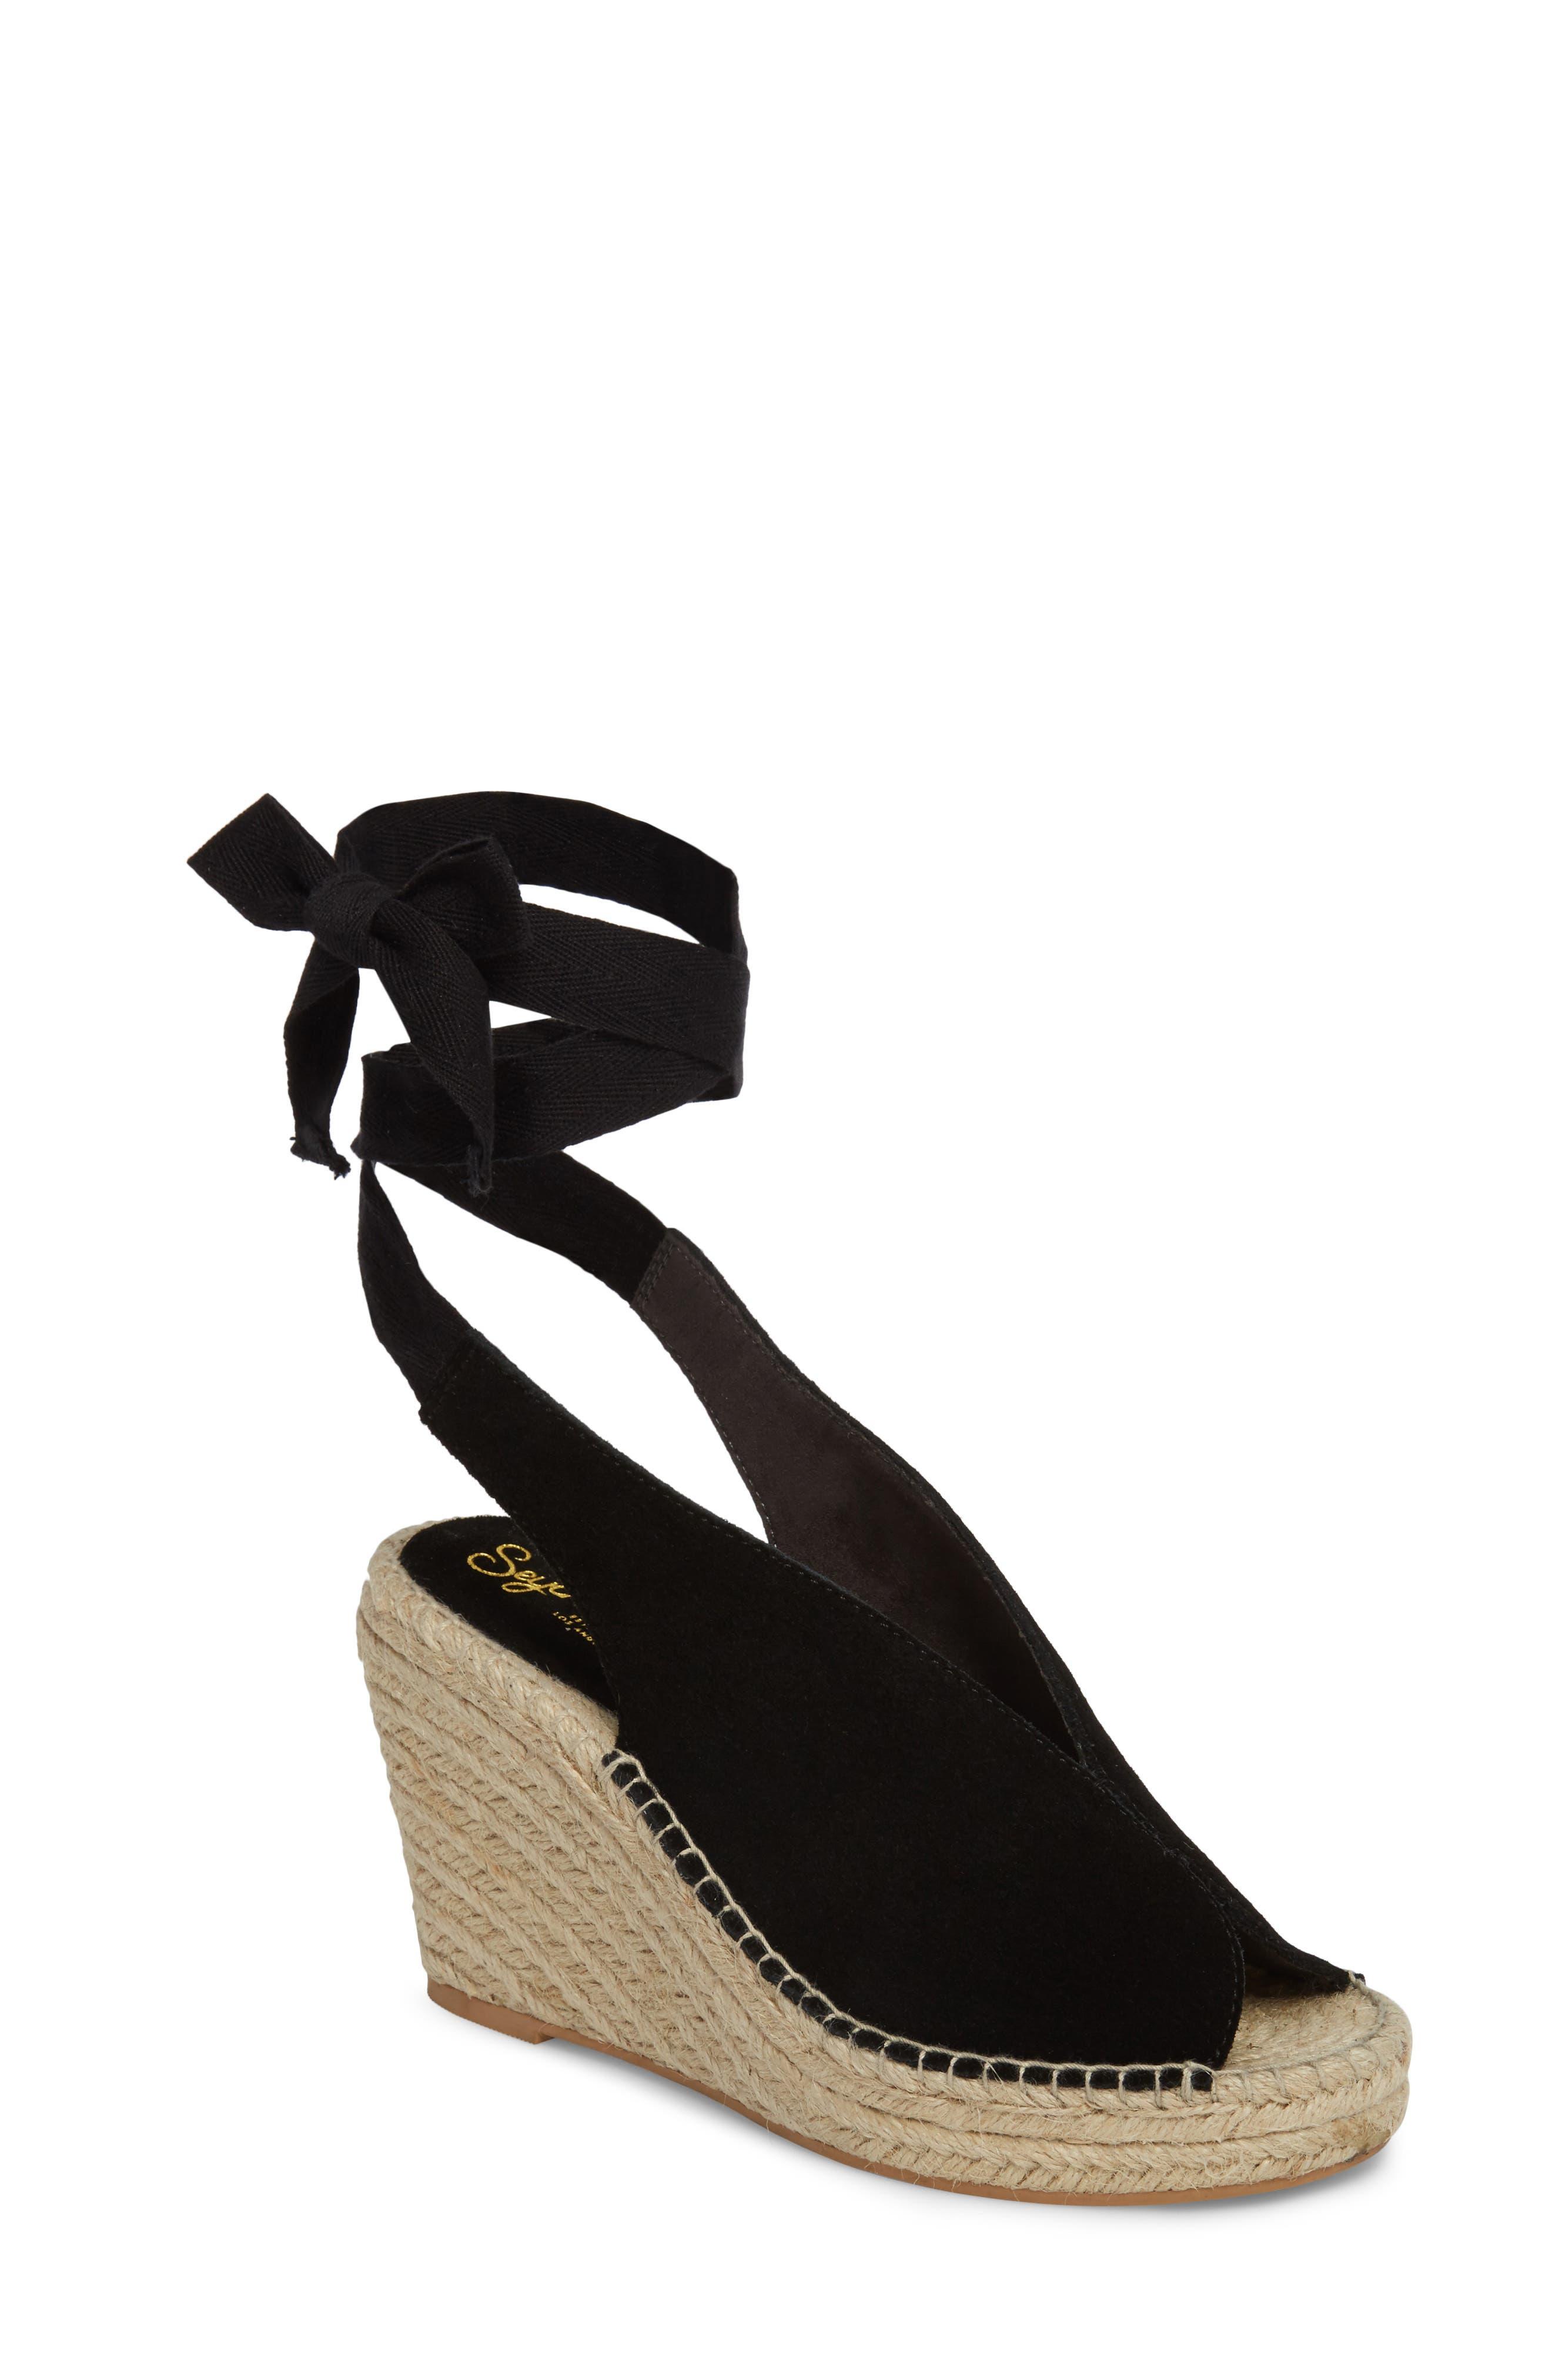 Interrelated Espadrille Wedge Sandal,                             Main thumbnail 1, color,                             001